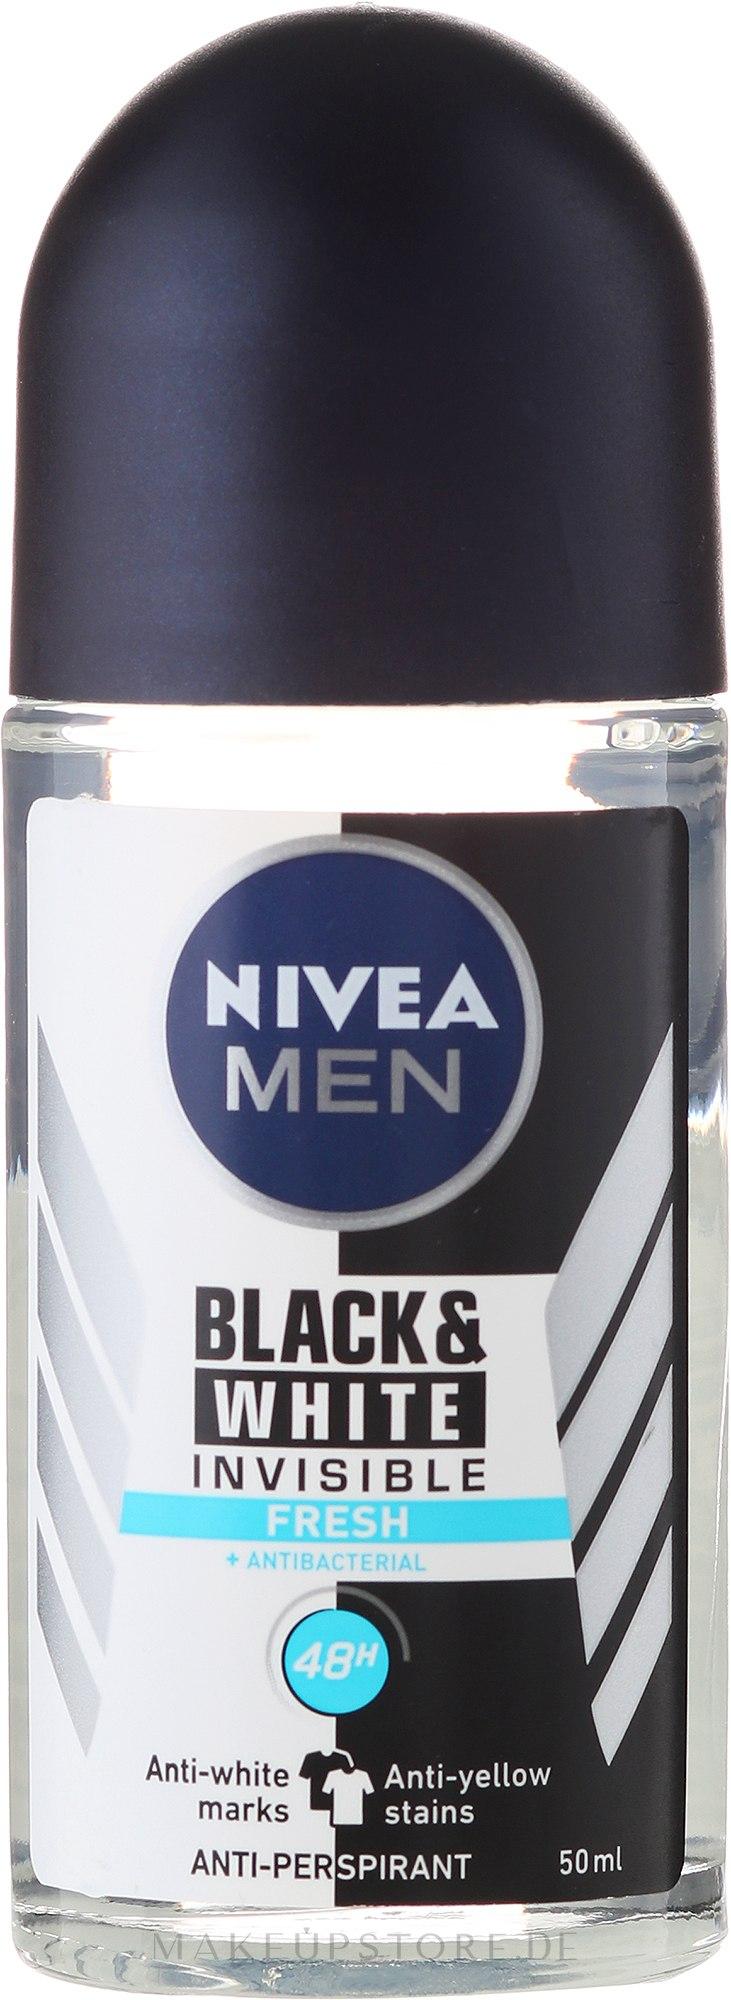 Deo Roll-on Antitranspirant - Nivea Men Invisible Fresh Black & White Antyperspirant — Bild 50 ml